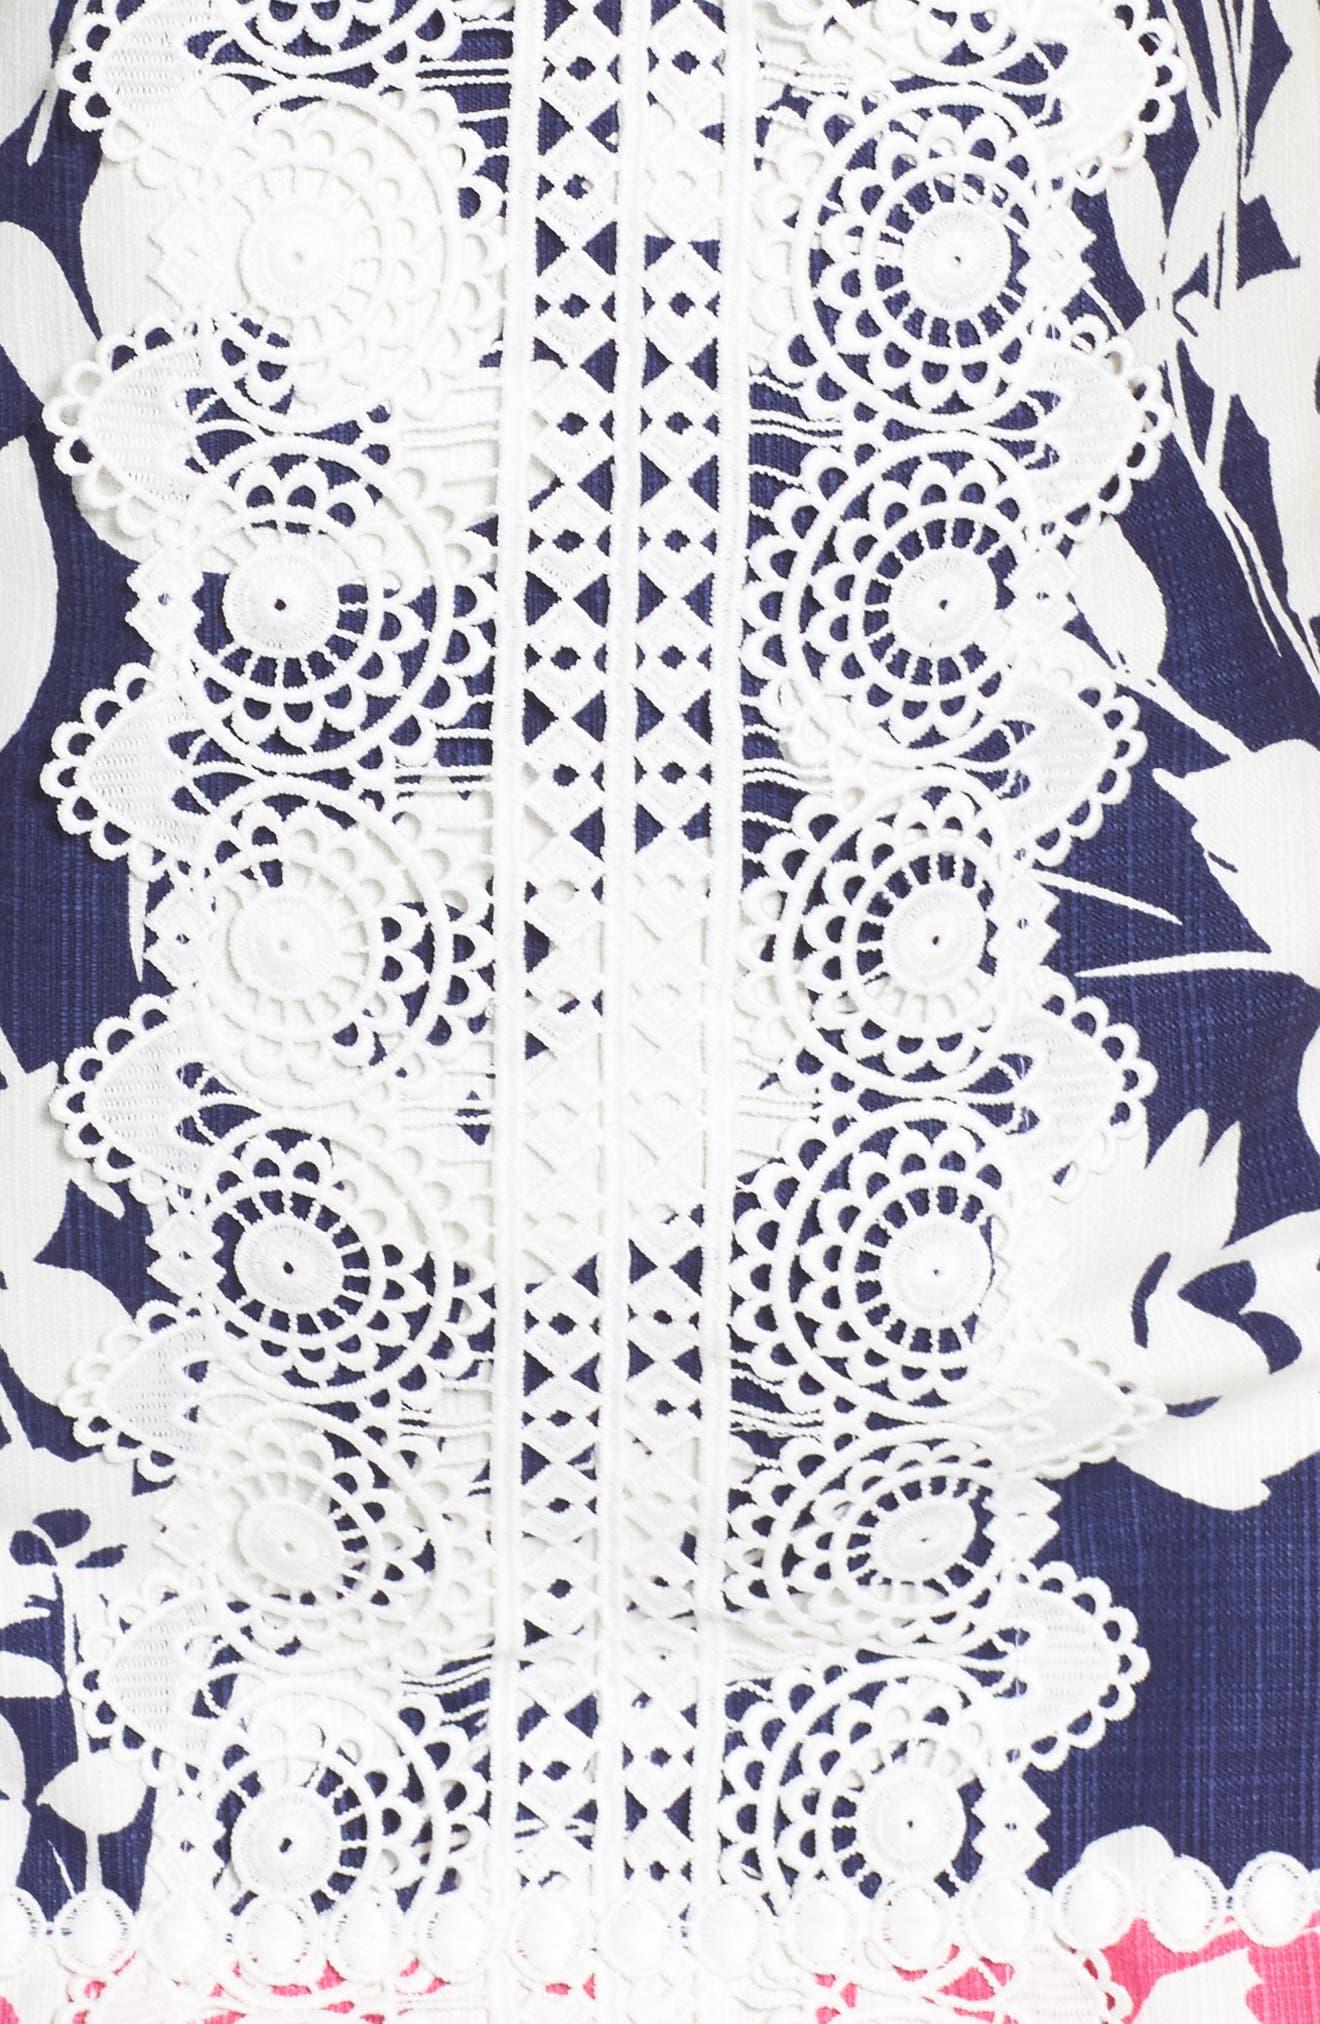 Stretch Cotton A-Line Dress,                             Alternate thumbnail 6, color,                             NAVY/ PINK